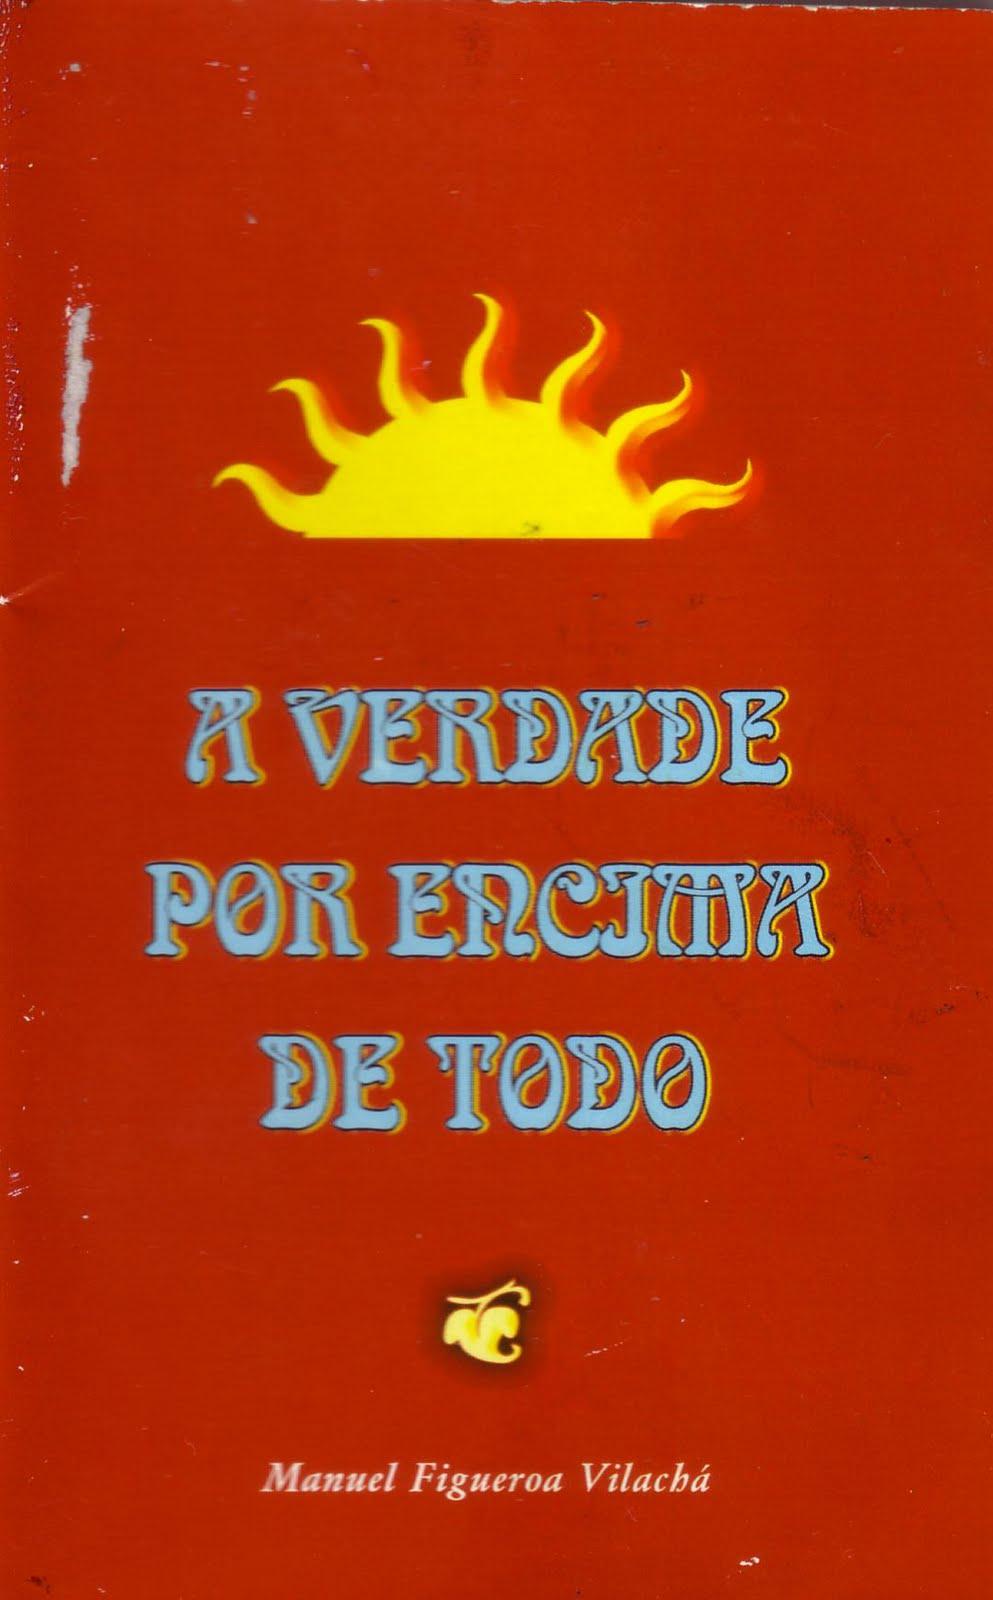 A VERDADE POR ENCIMA DE TODO